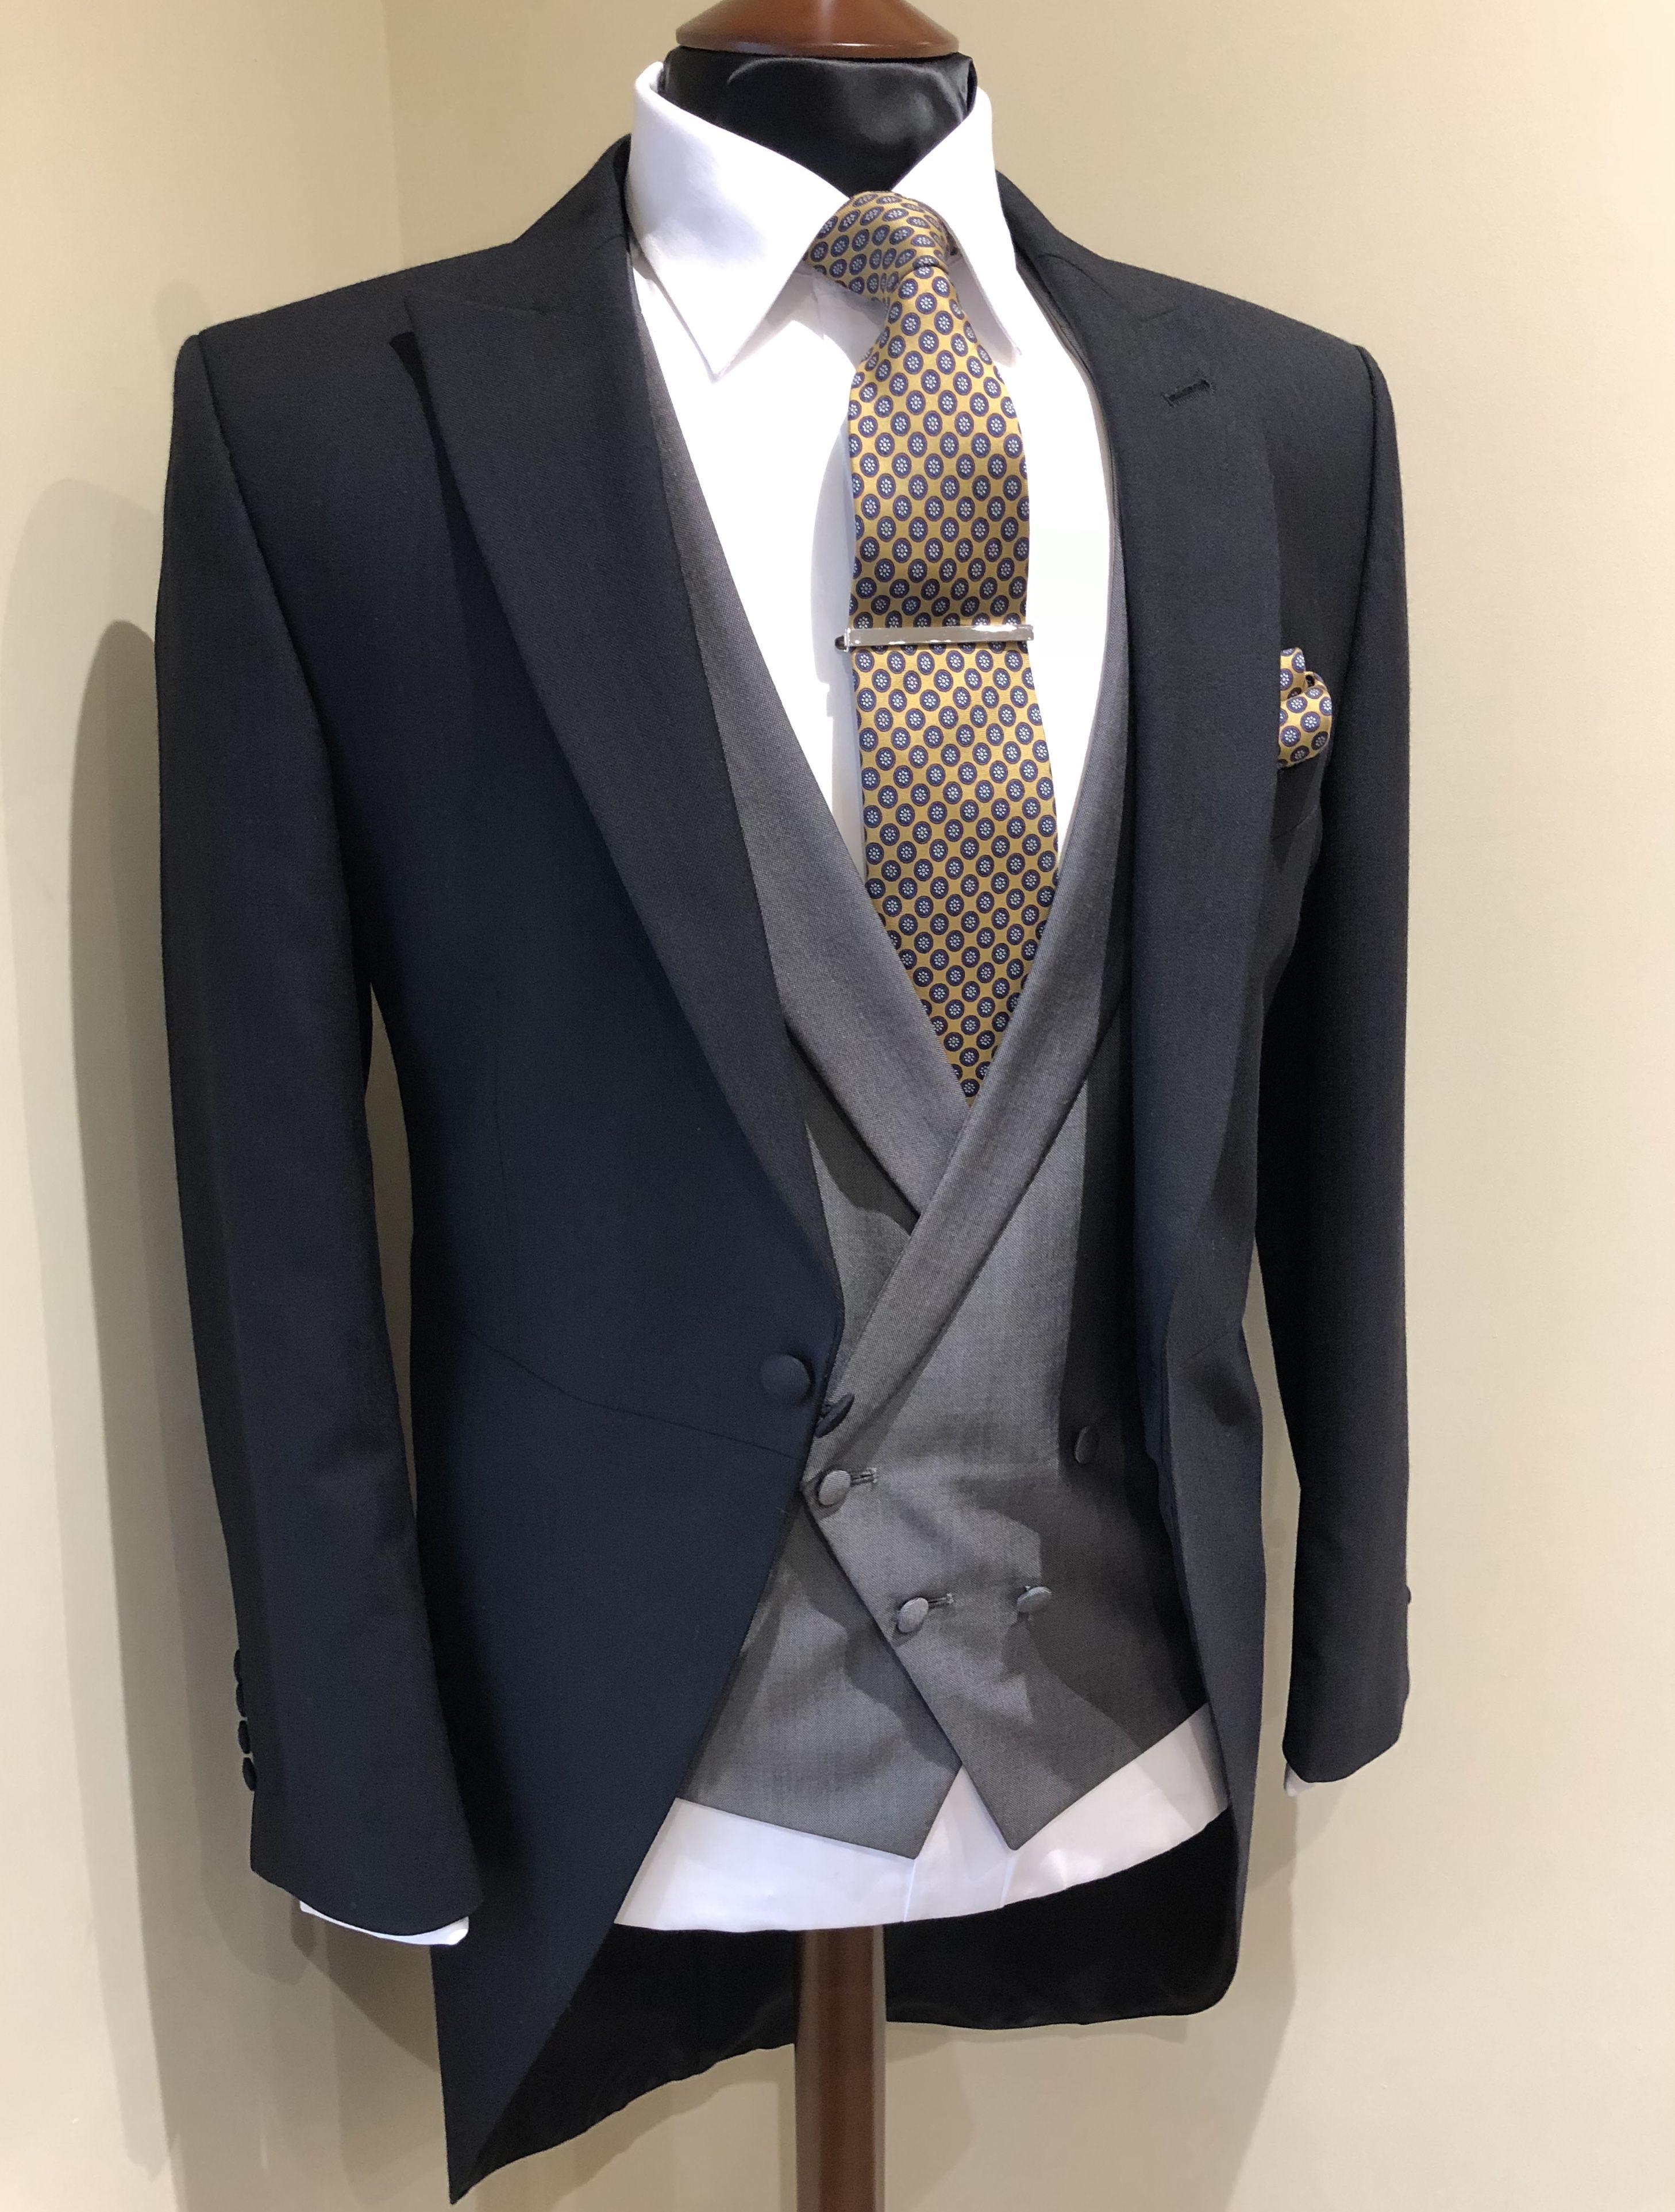 Black Morning Suit With Grey Double Breasted Waistcoat Mustard Tie Groom Wedding Suit Wedding Suit Hire Groom Suit Black Wedding Morning Suits